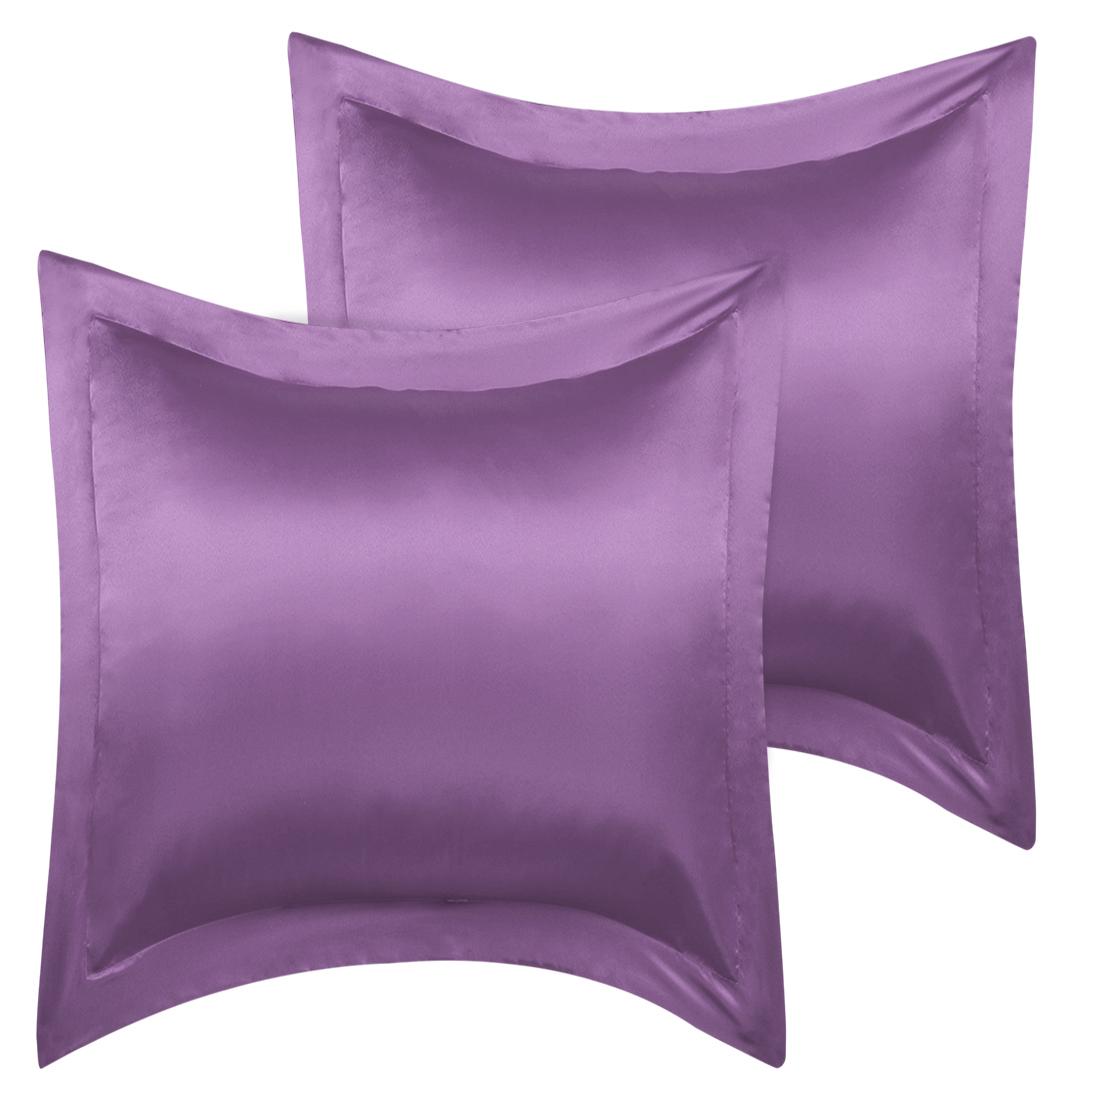 2 Pcs Purple Pillow Shams Satin Pillow Cases European Oxford Pillowcases